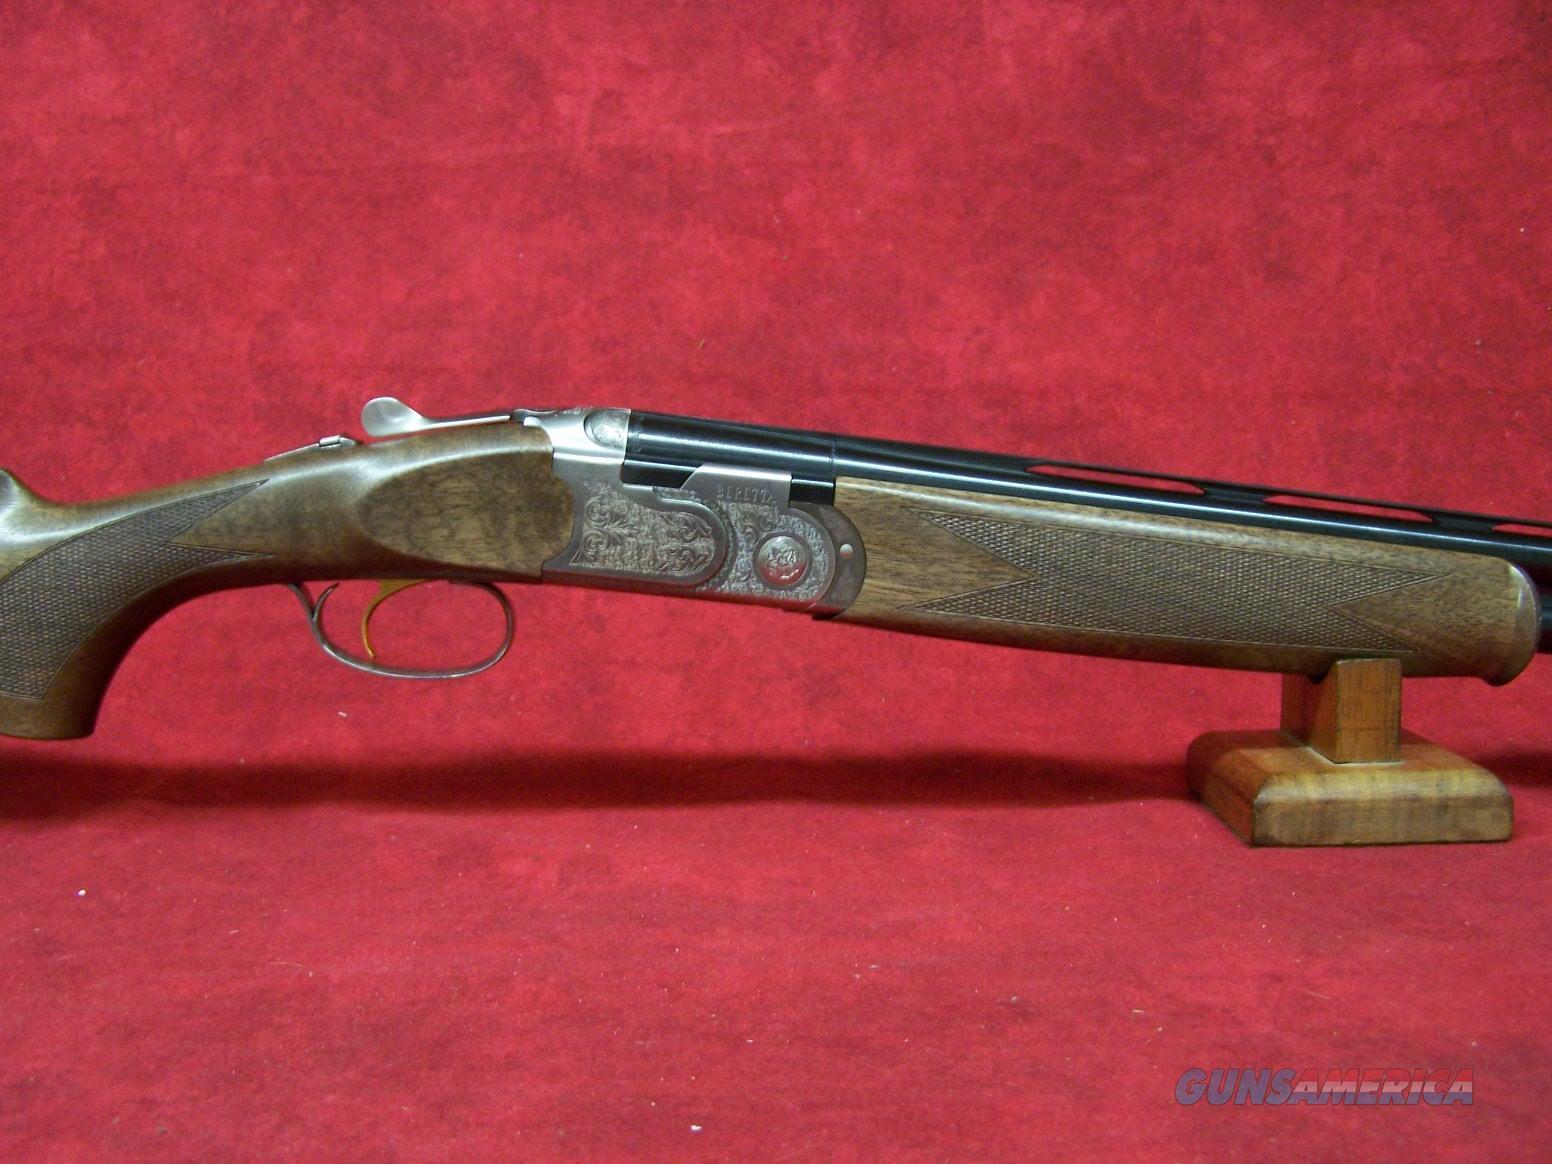 Beretta 686 Silver Pigeon I Over/Under 20 Gauge 3 Inch Chamber 26 Inch Barrel (J6863K6)  Guns > Shotguns > Beretta Shotguns > O/U > Hunting